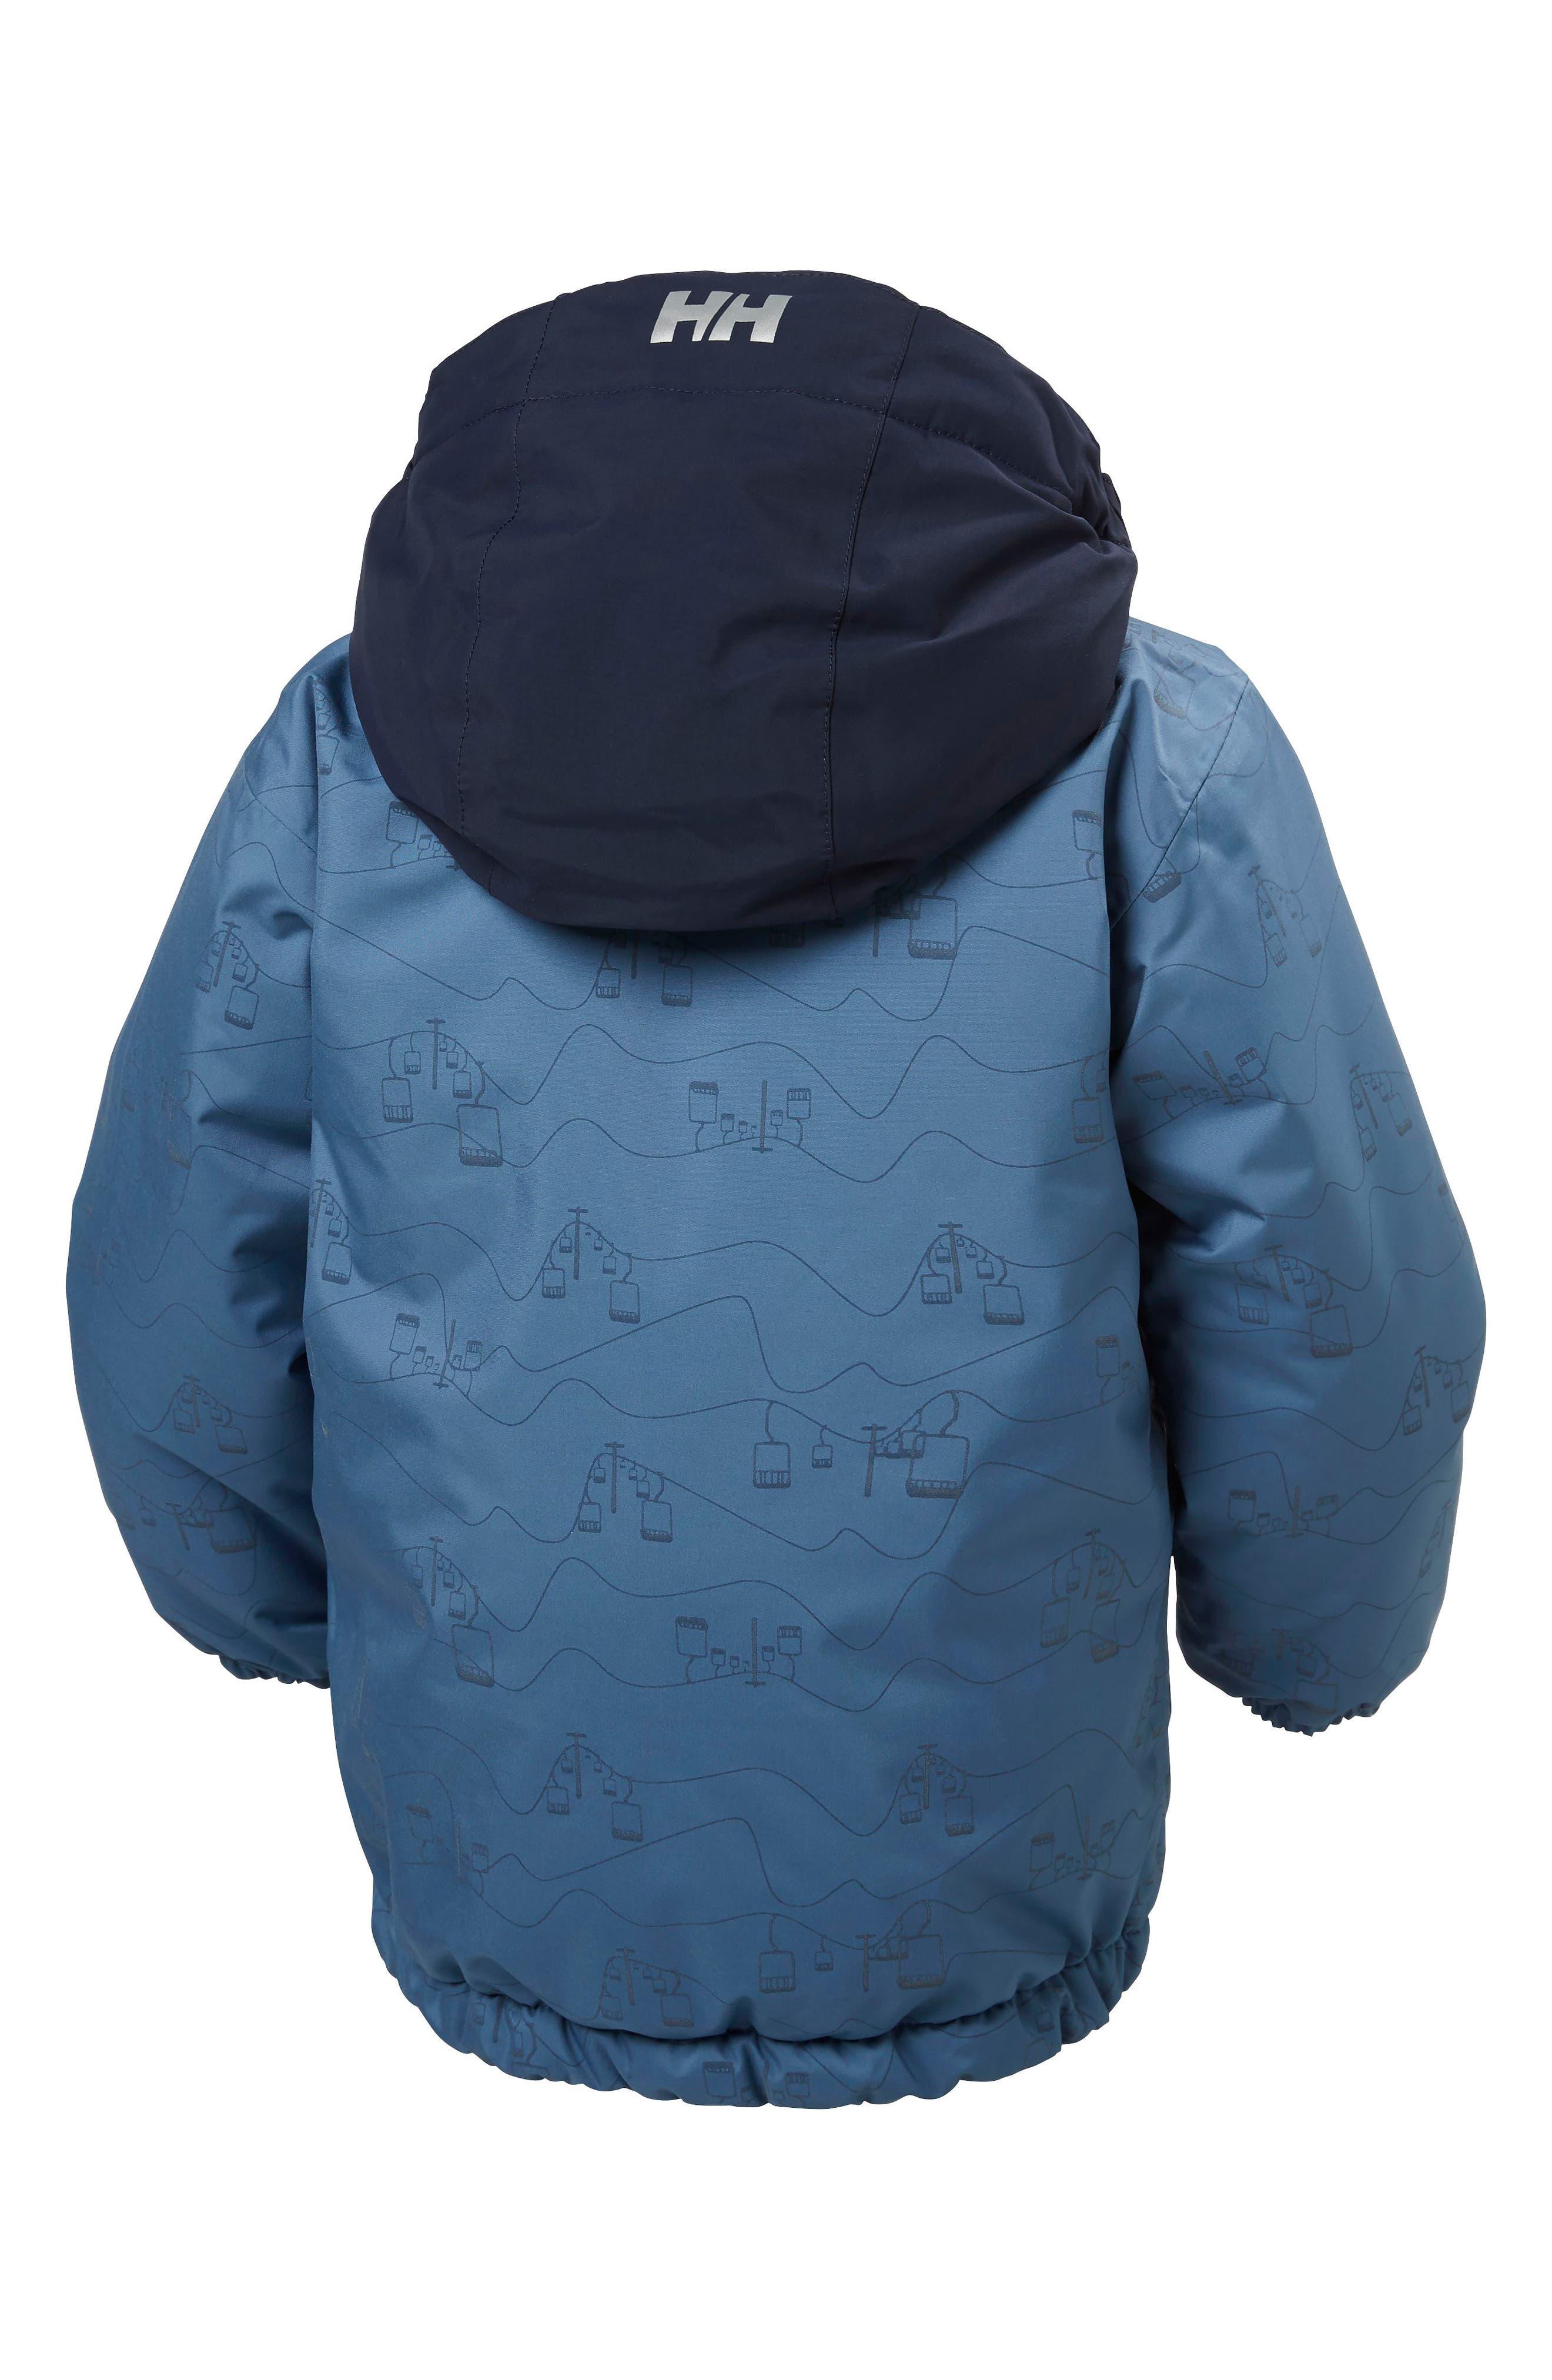 Alternate Image 2  - Helly Hansen Snowfall Waterproof Insulated Jacket (Toddler Boys, Little Boys & Big Boys)